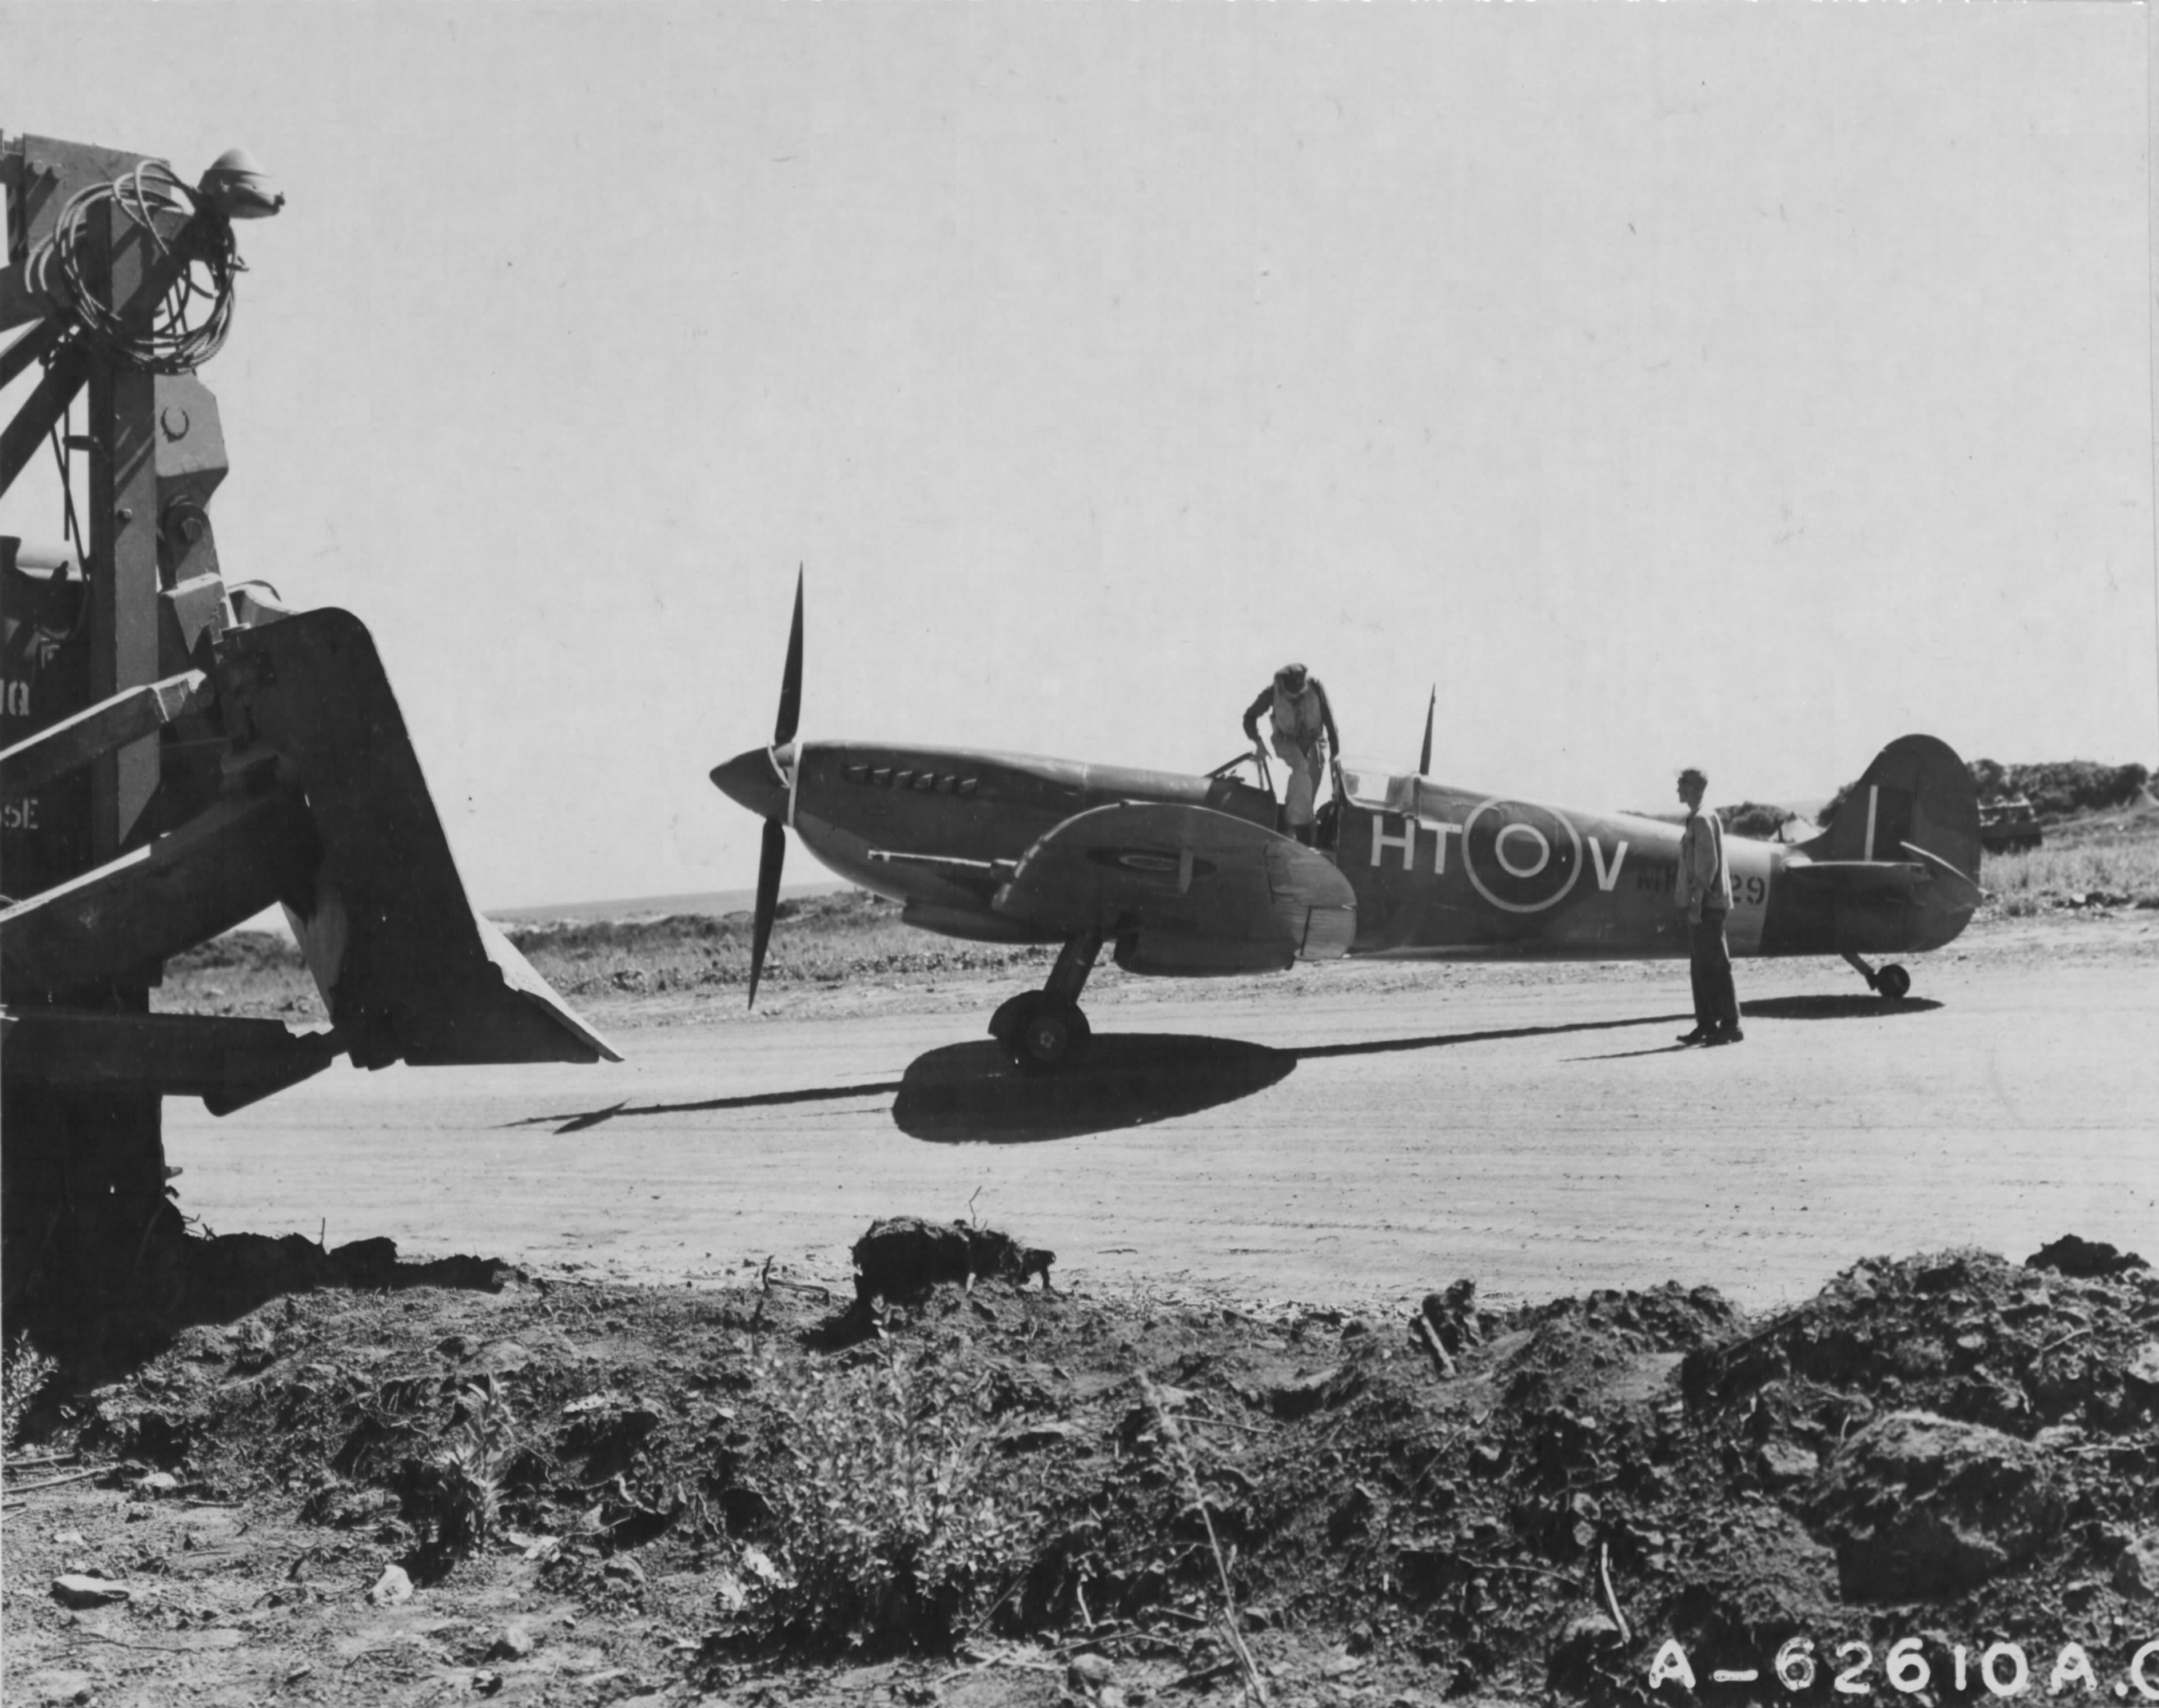 Spitfire LFIXc RAF 154Sqn HTV after landing Corsica 1944 02